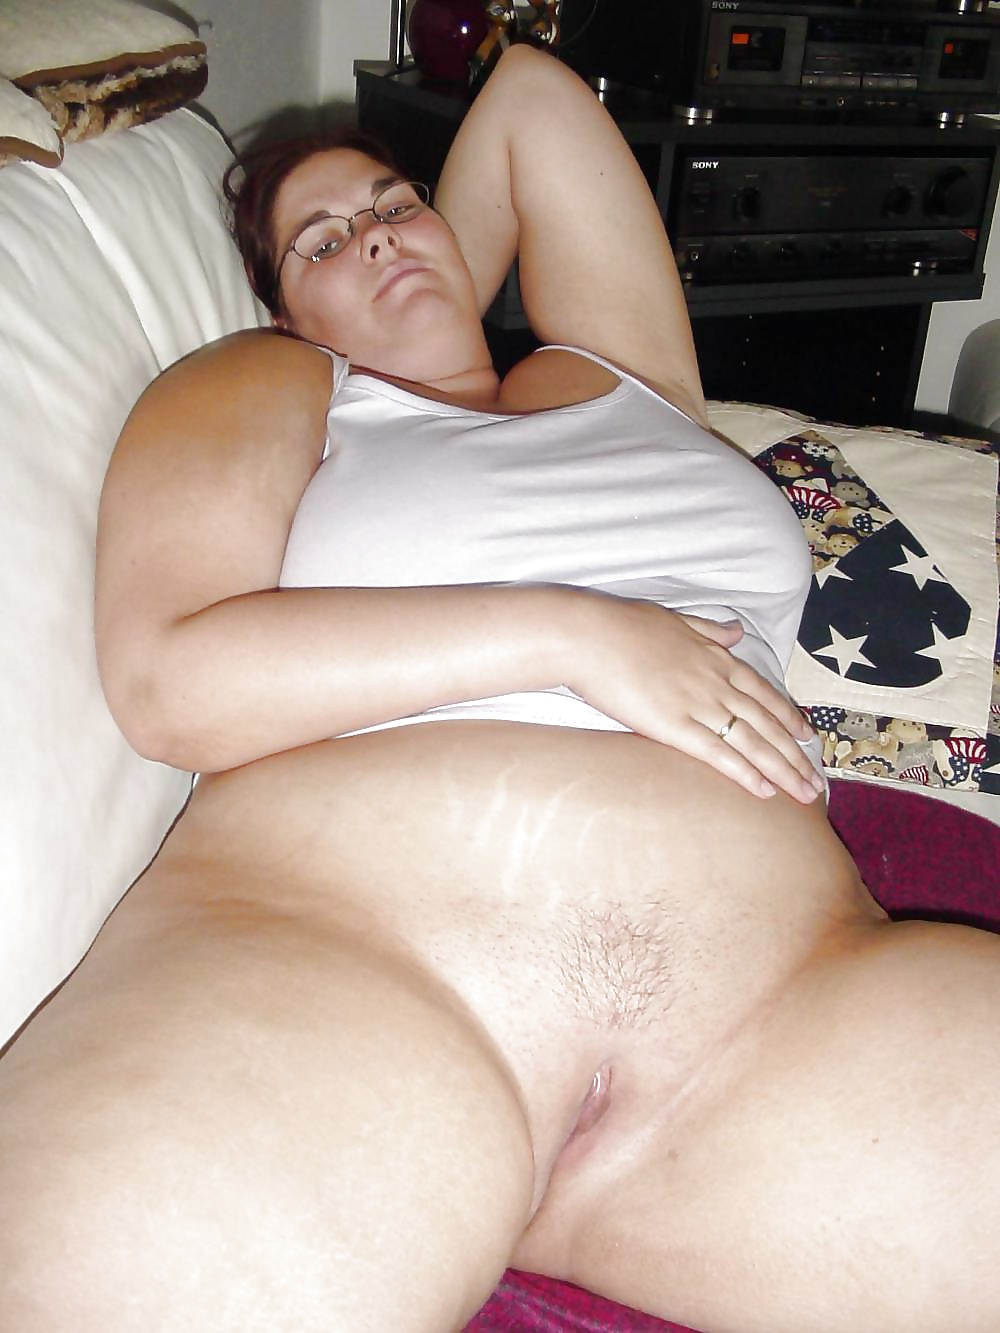 Ukraine girl pic porn